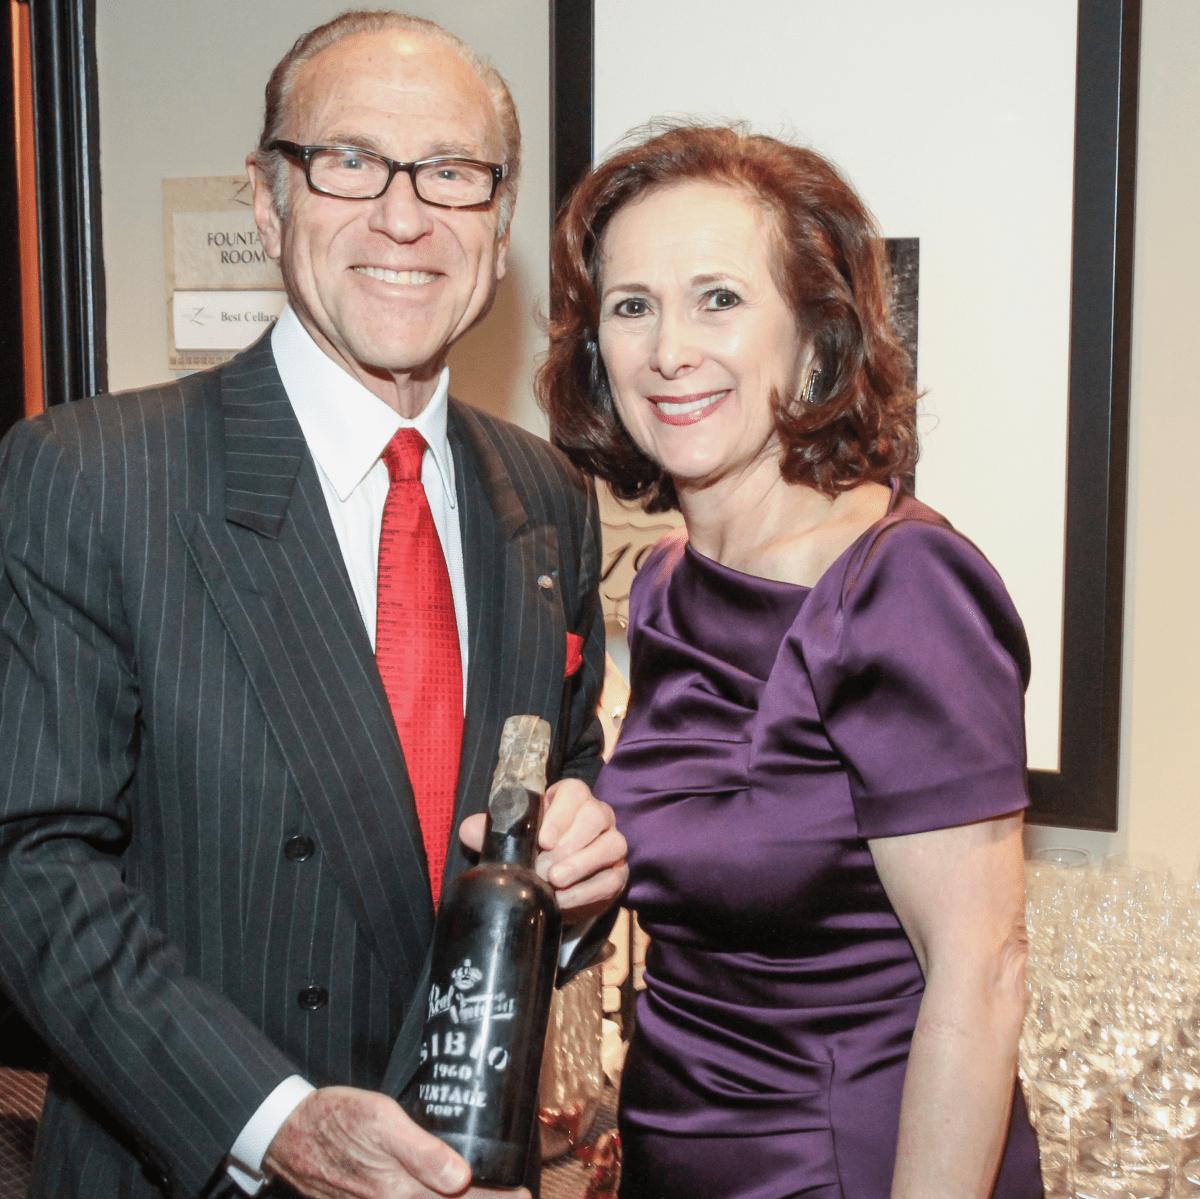 Best Cellars Wine/Robert Sakowitz and Franelle Rogers